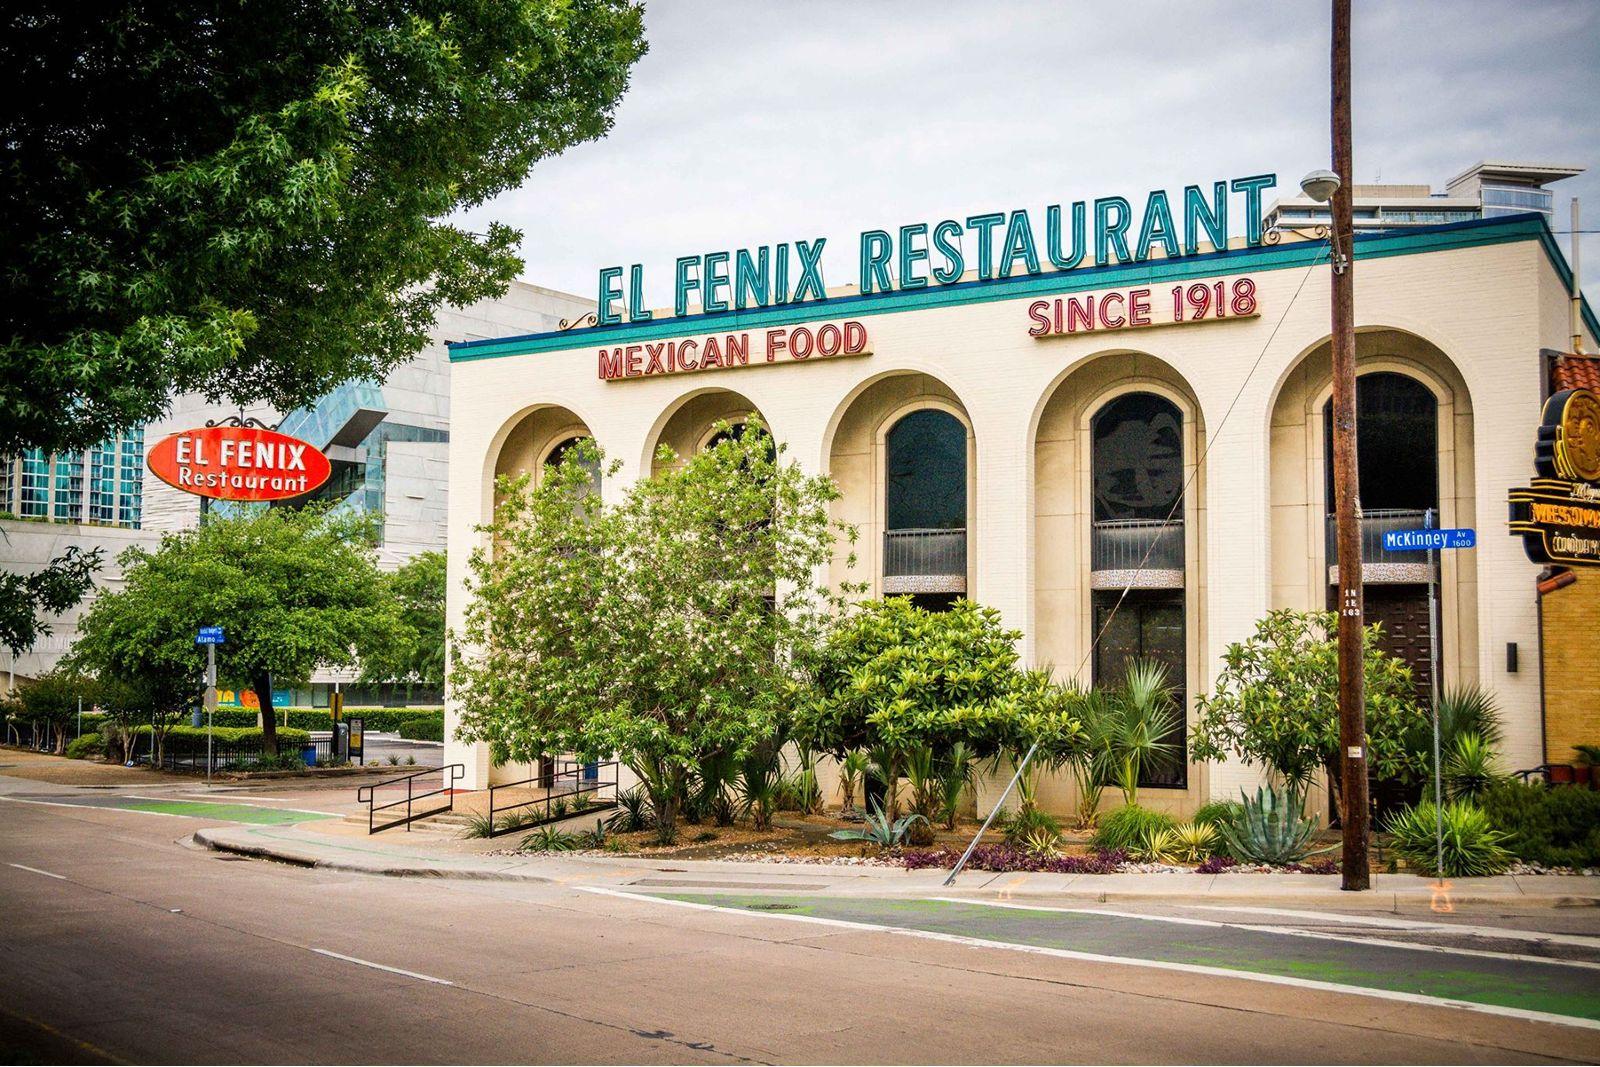 El Fenix Celebrates a Century of Tex-Mex with Epic 100th Anniversary Party